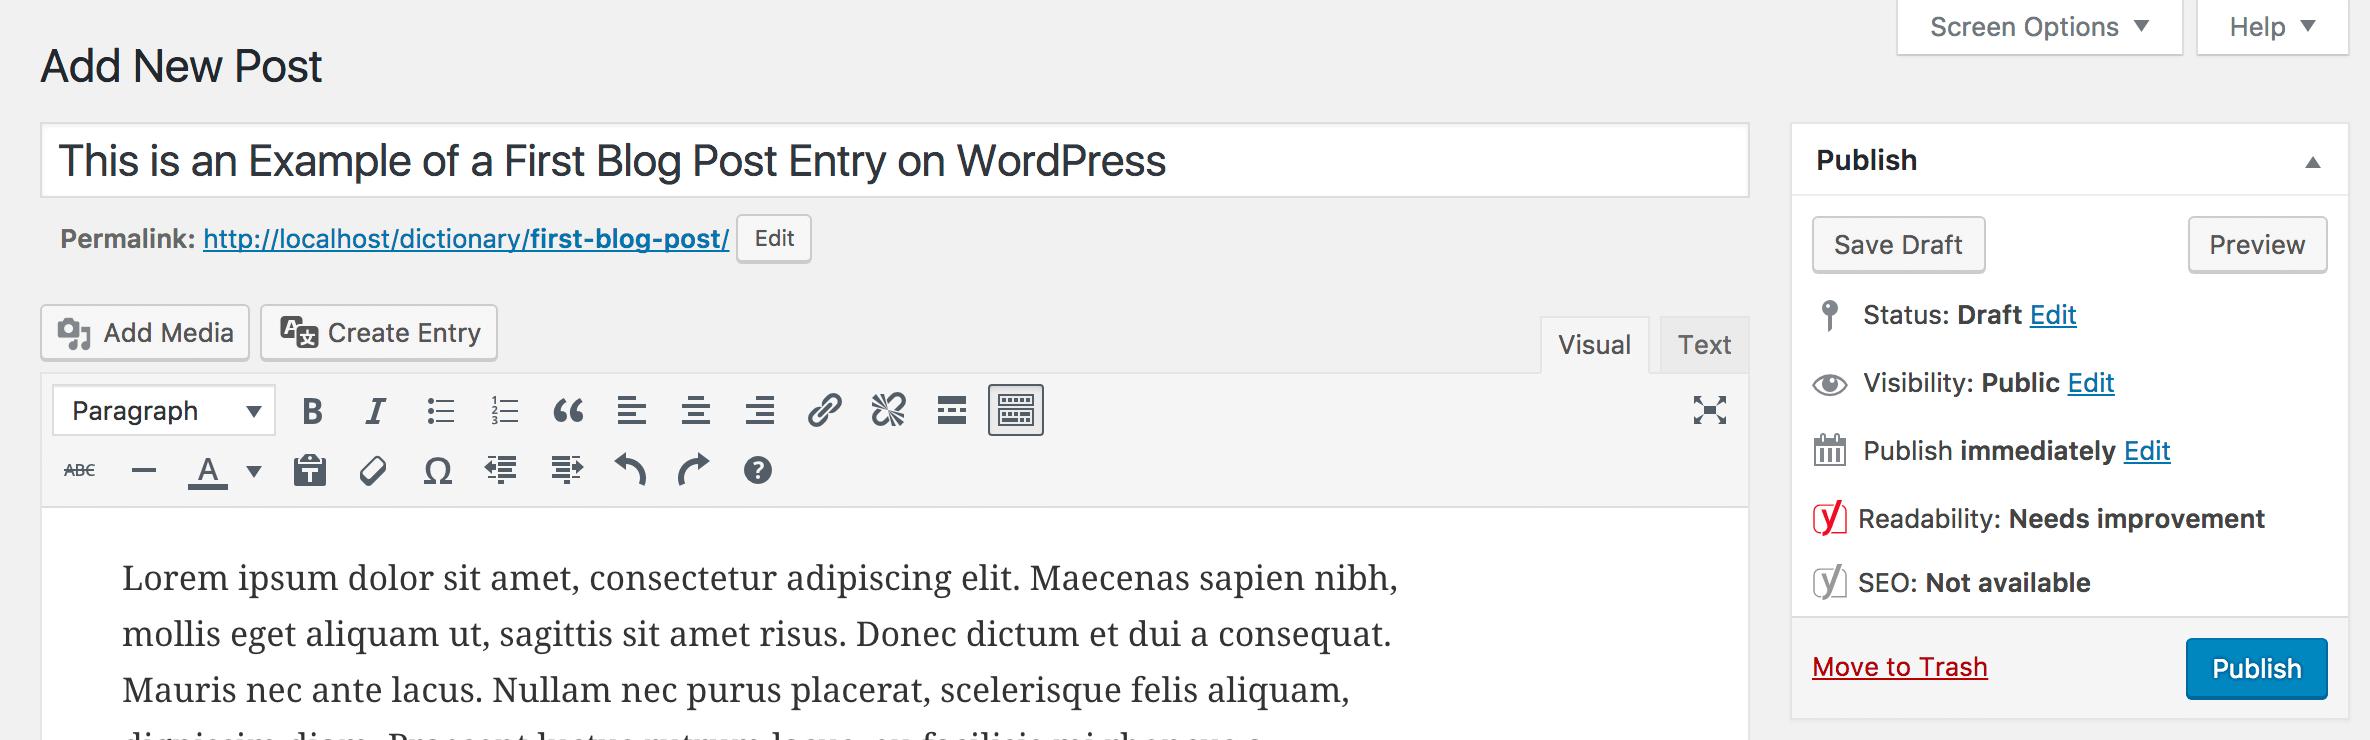 WordPress new post publishing